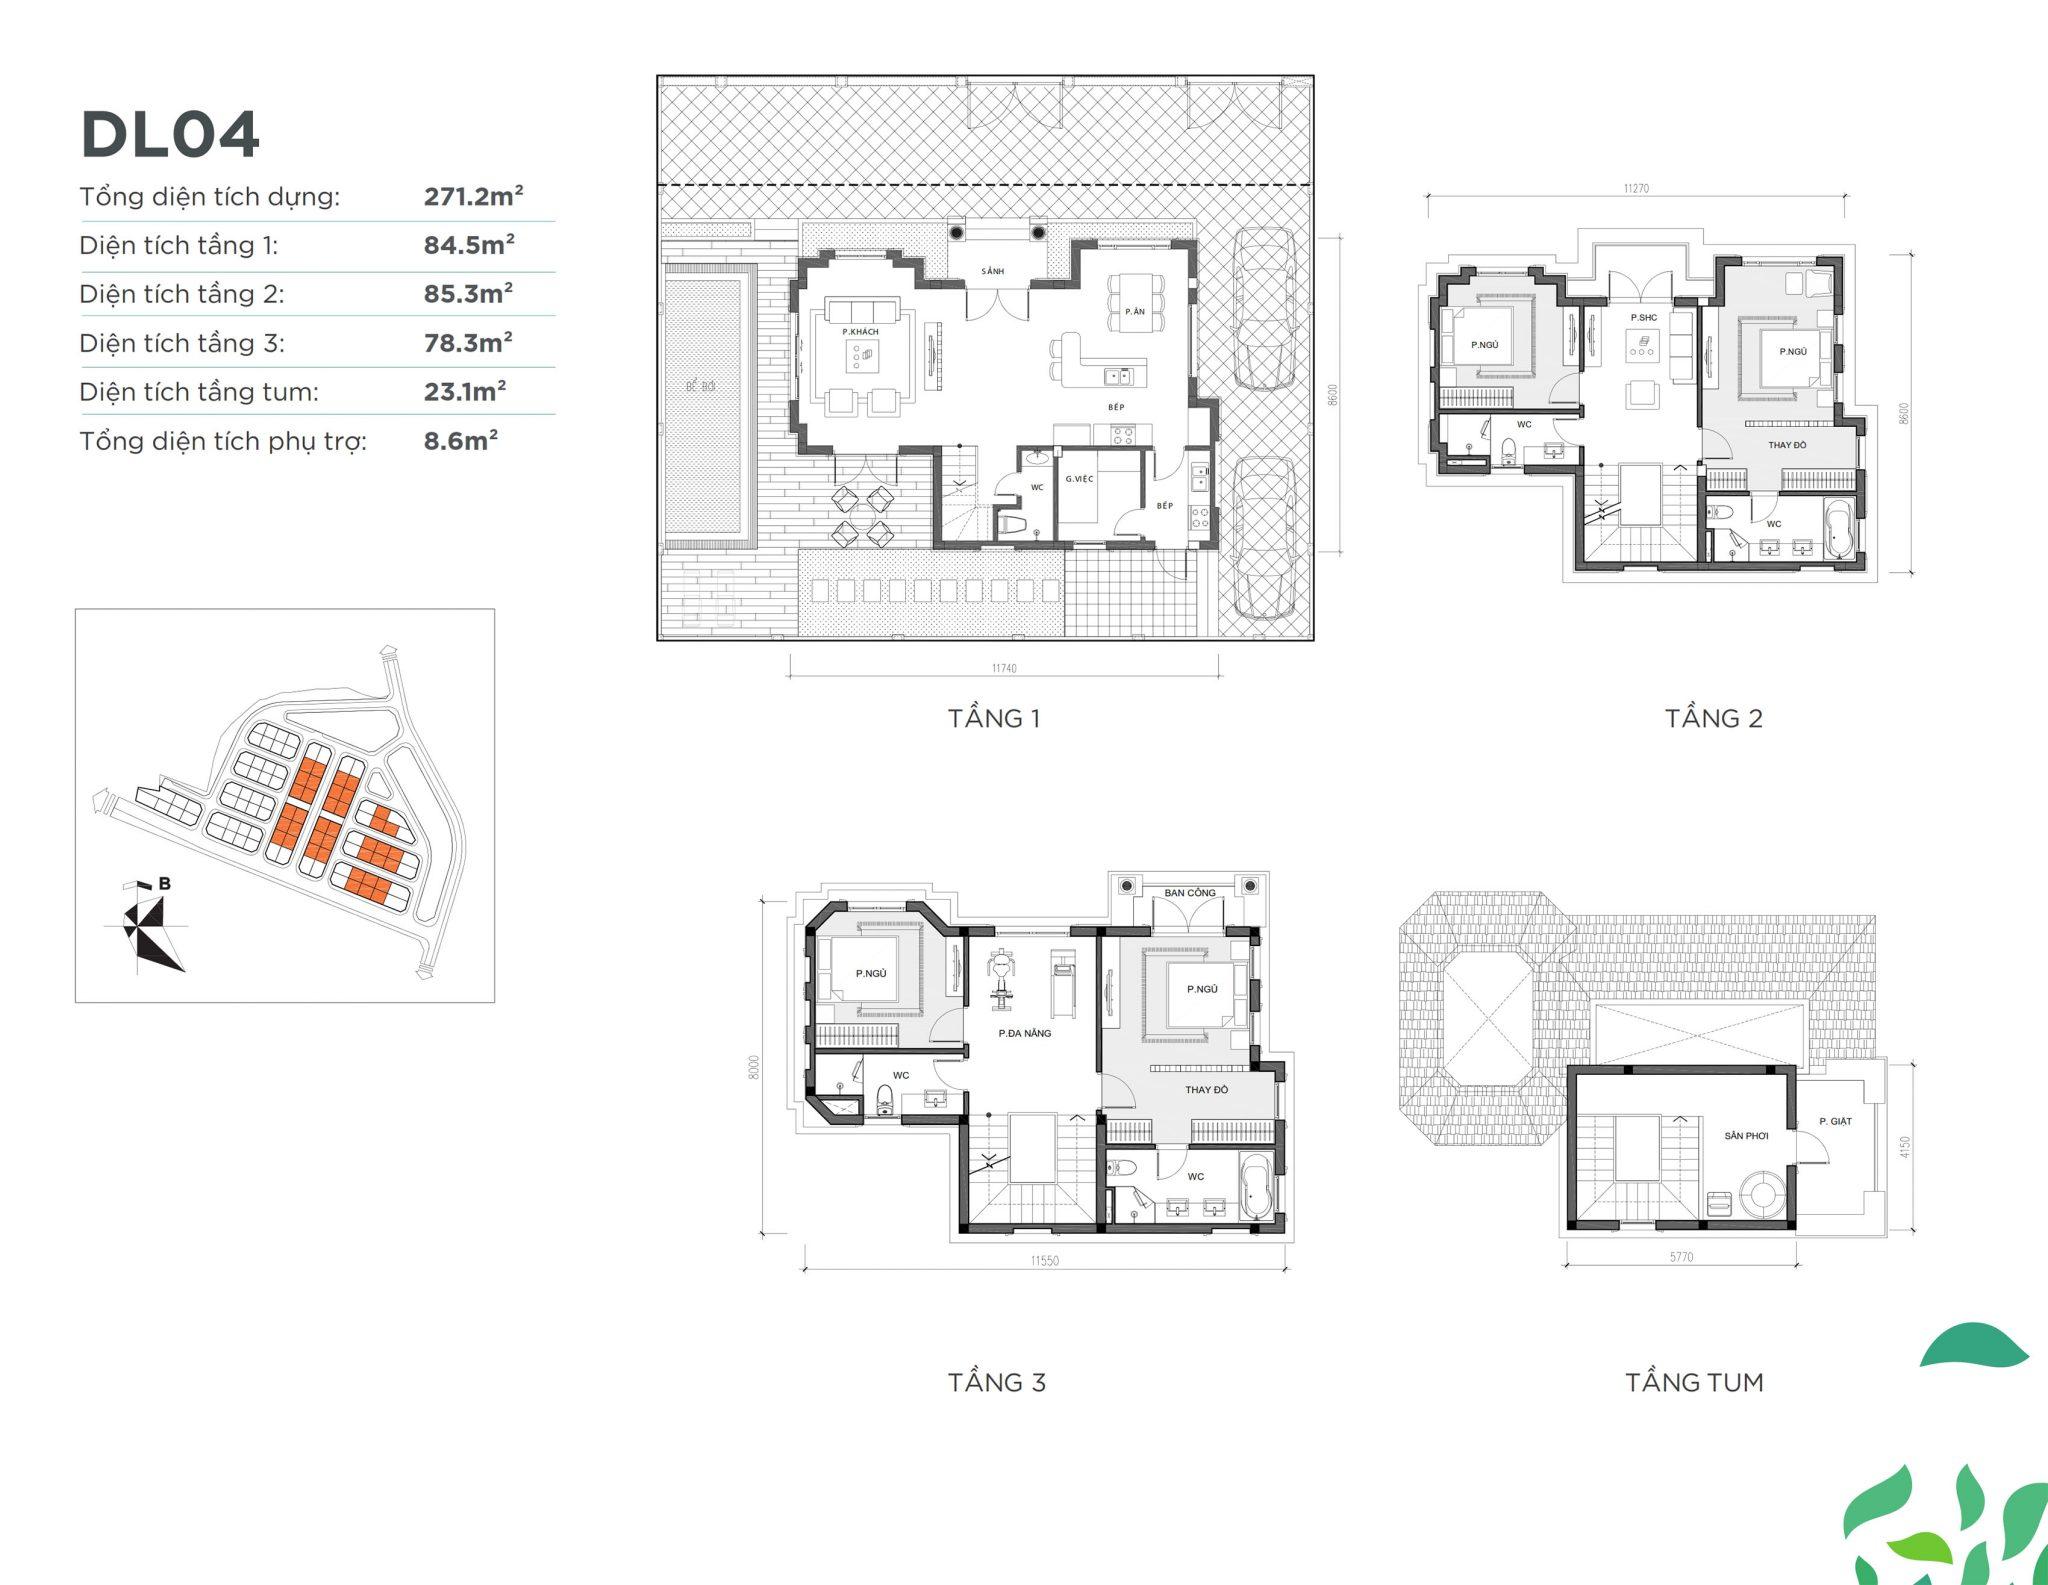 biet-thu-dl04-vinhomes-green-villas